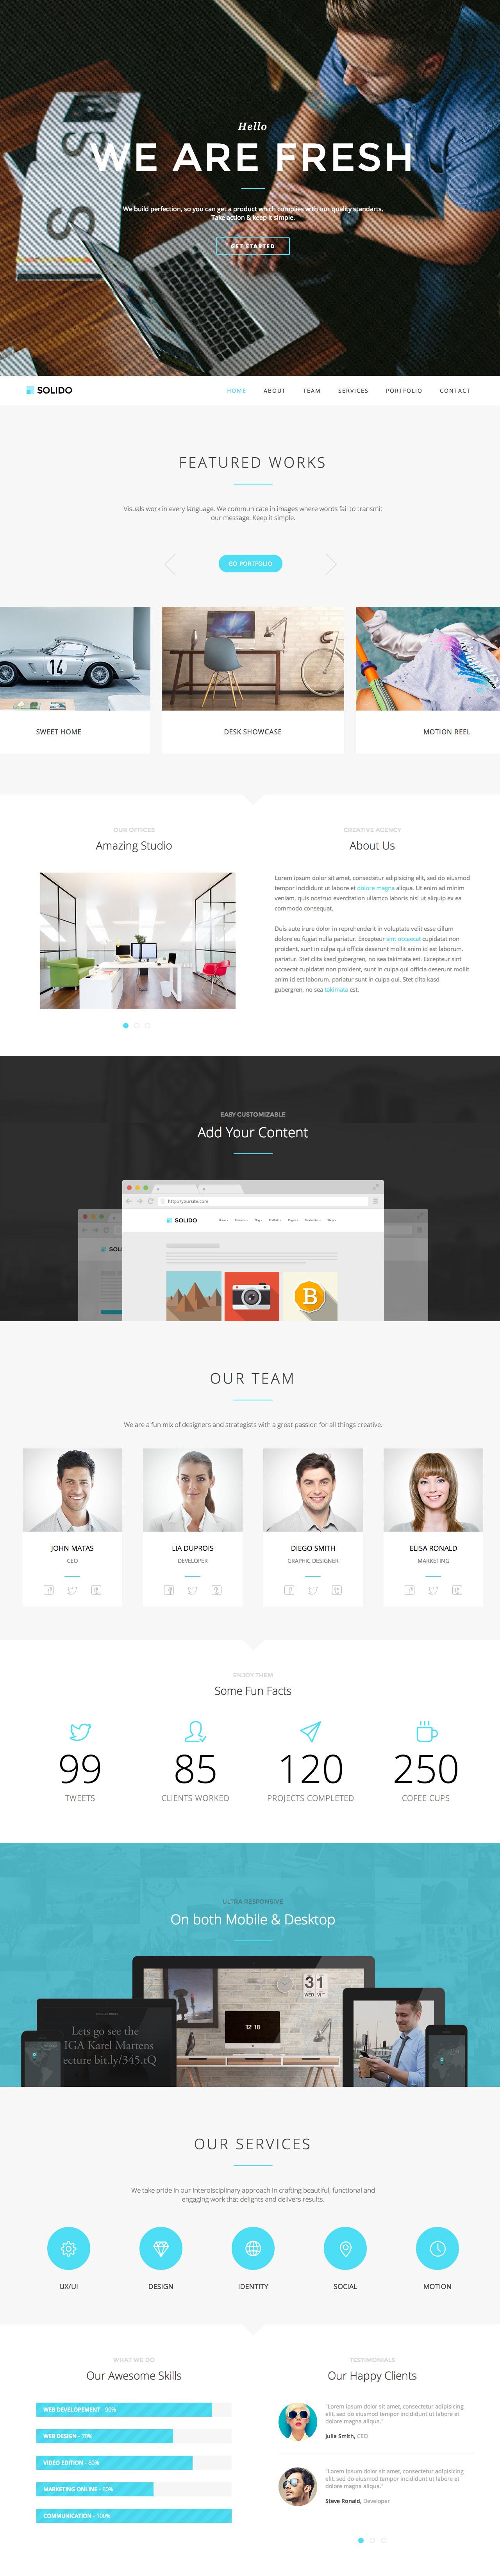 Solido Website Screenshot